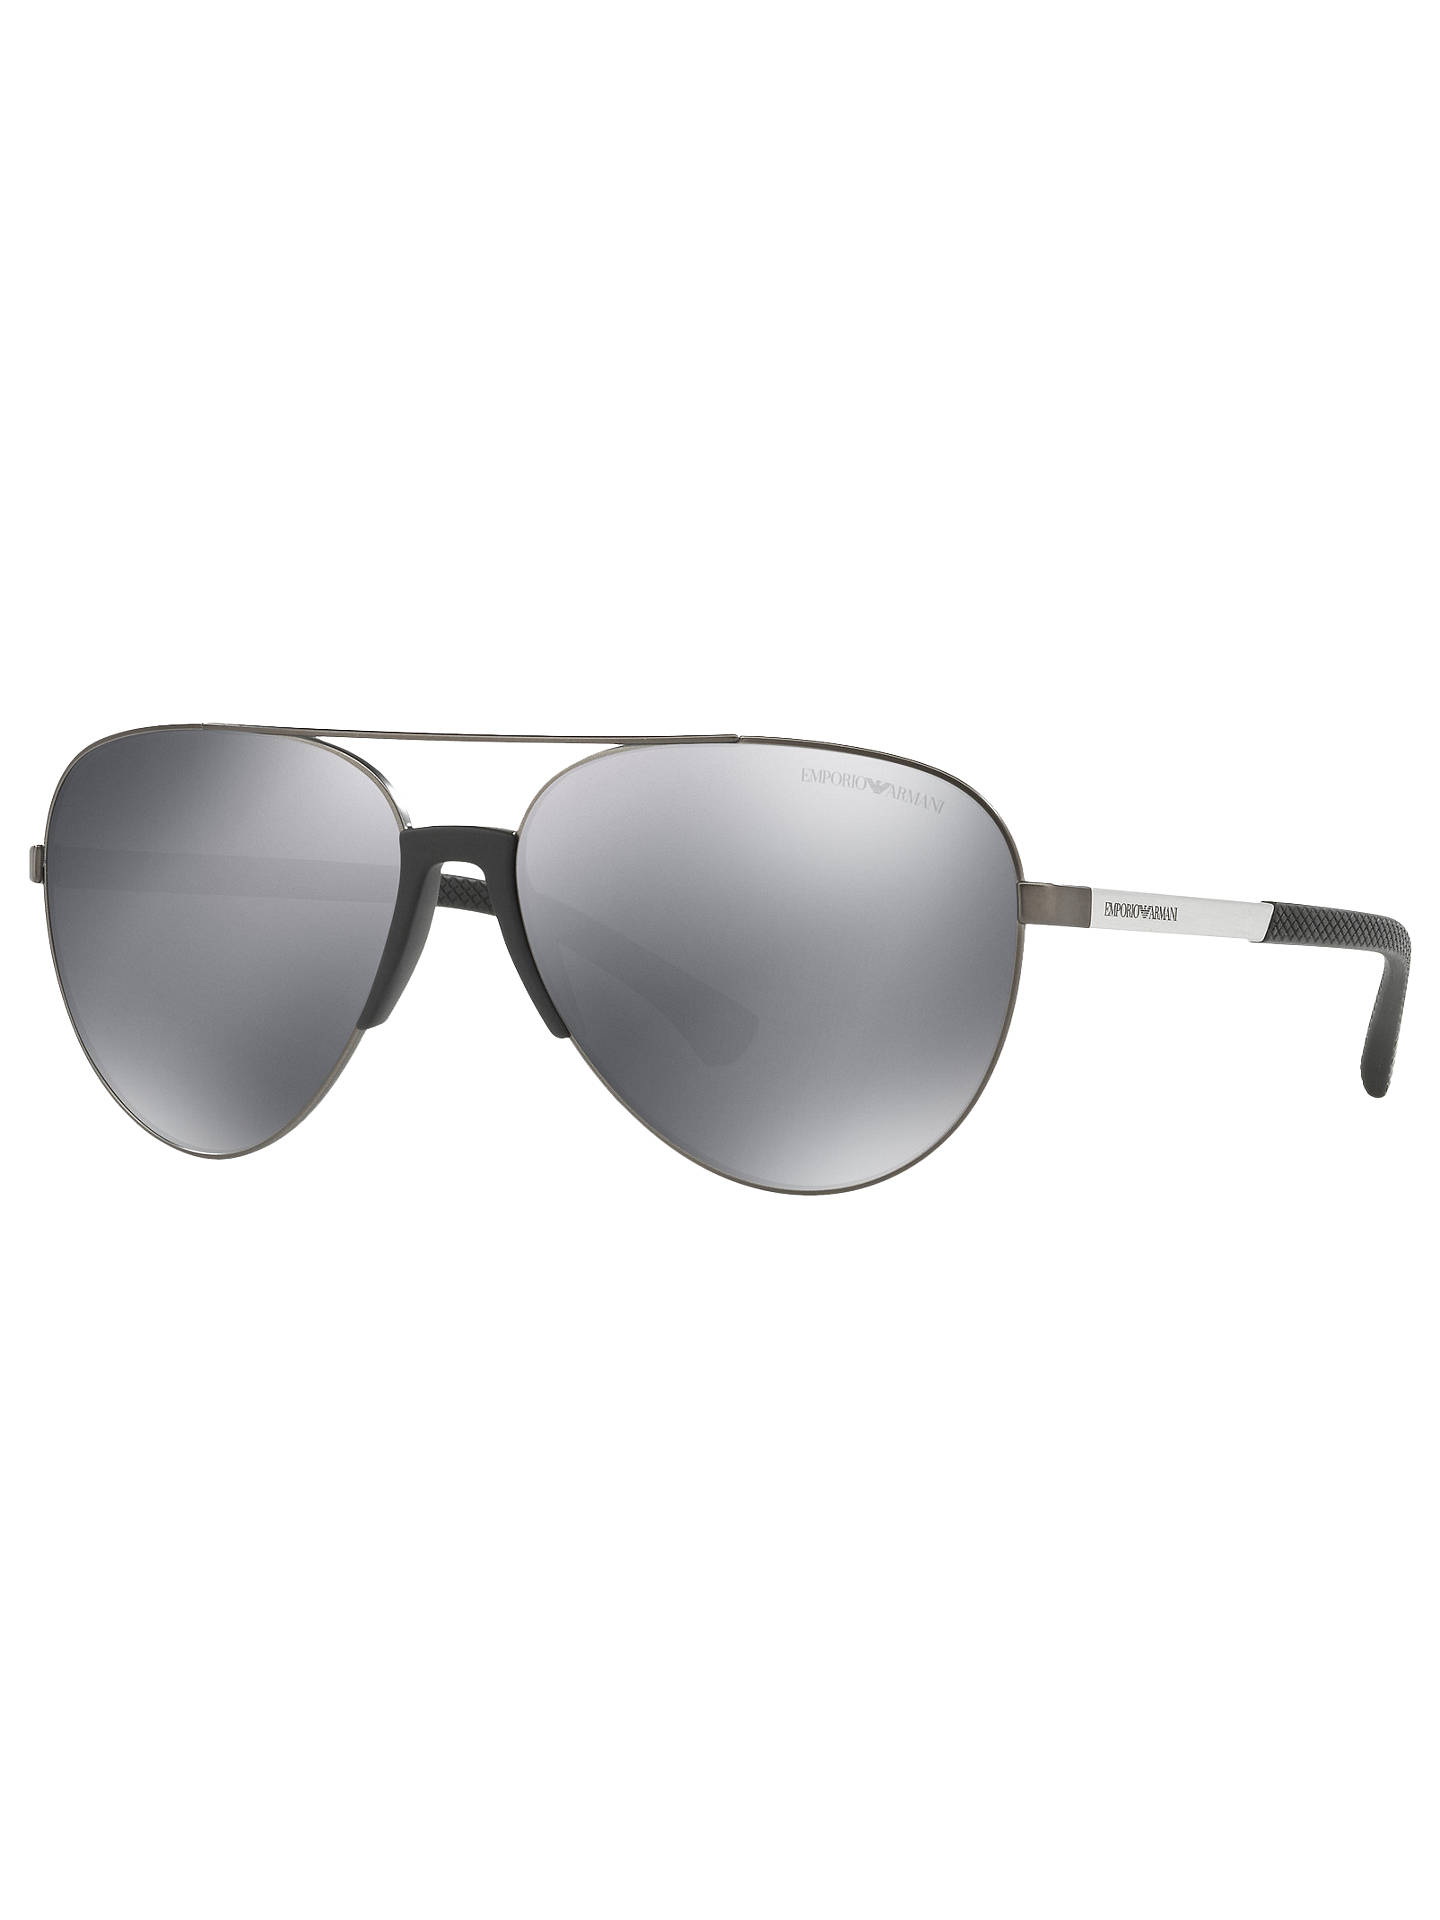 8c9e1195152f Buy Emporio Armani EA2059 Aviator Sunglasses, Black/Mirror Grey Online at  johnlewis.com ...